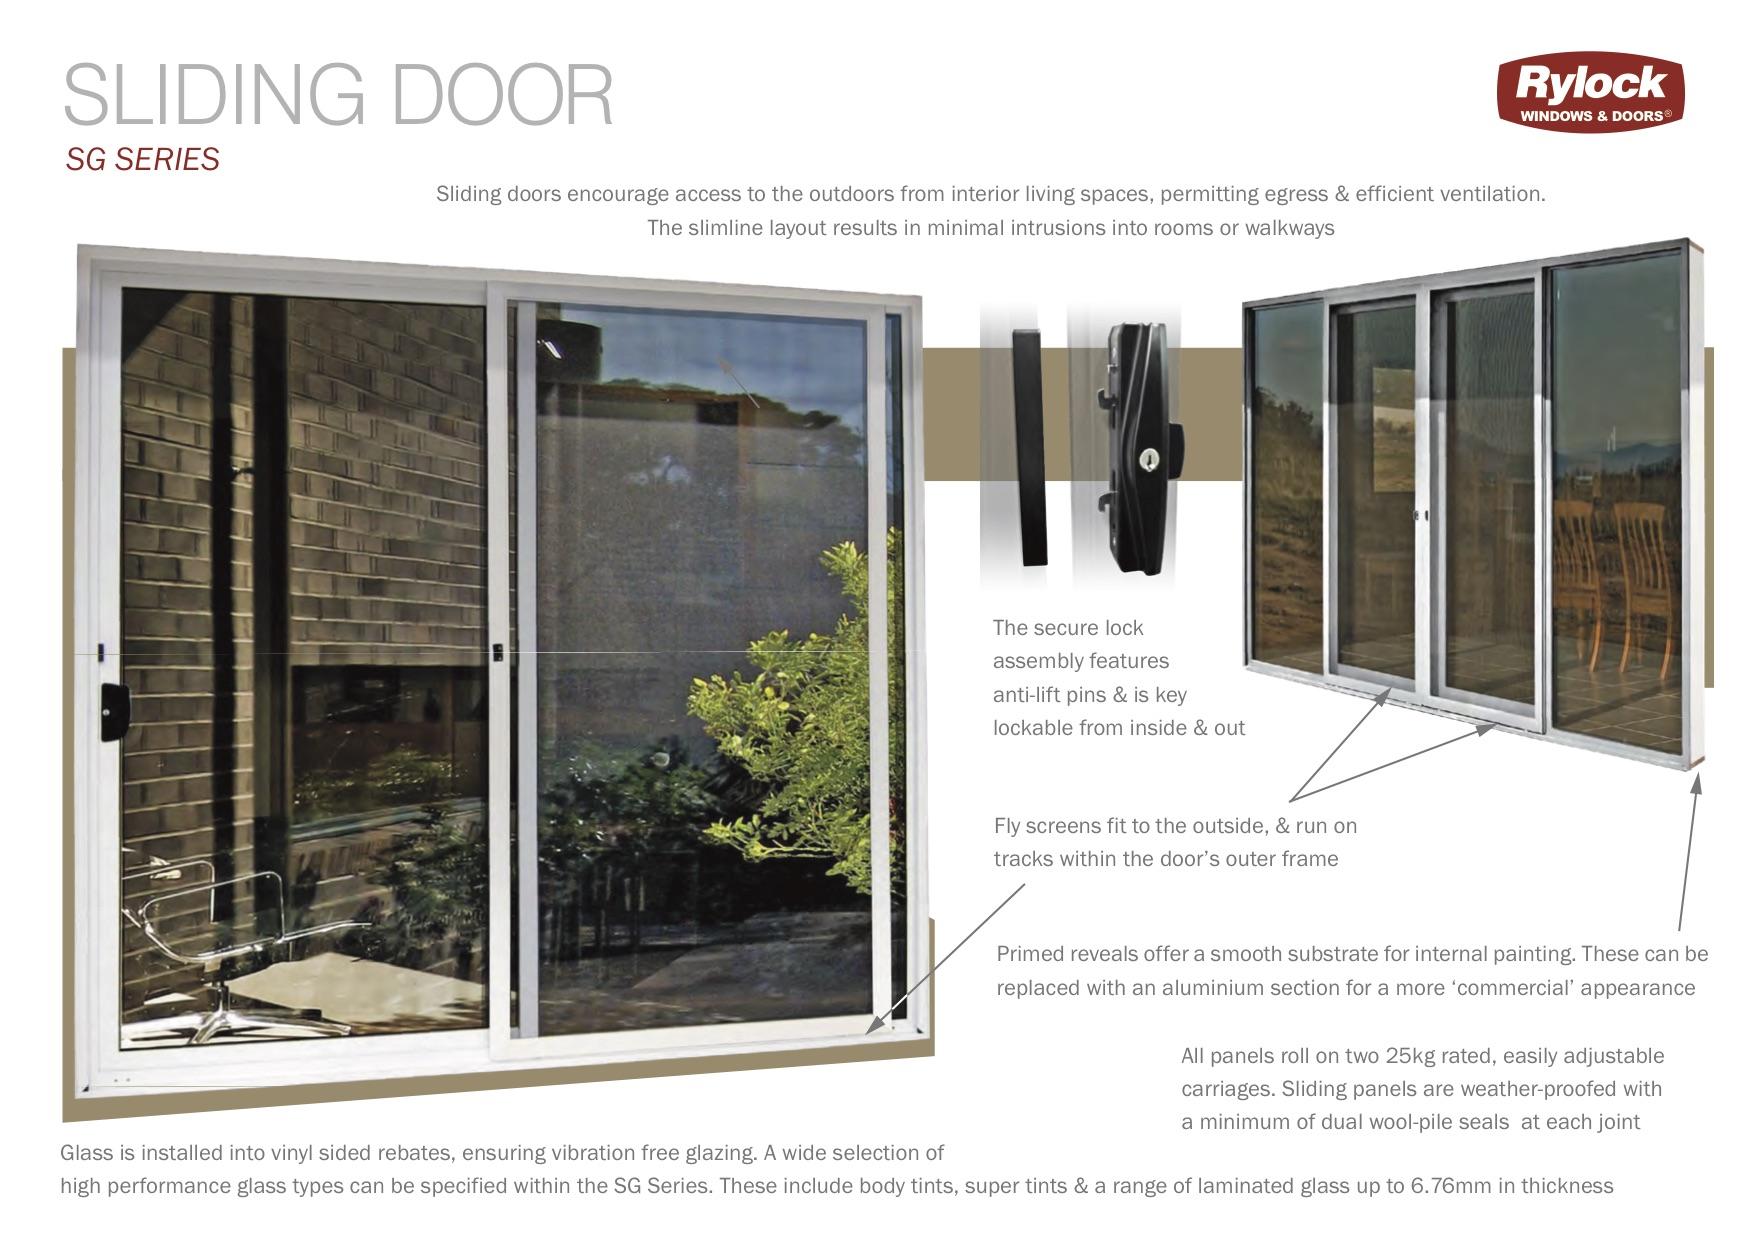 Sliding patio door handle screws barn and patio for Sliding barn doors for patio